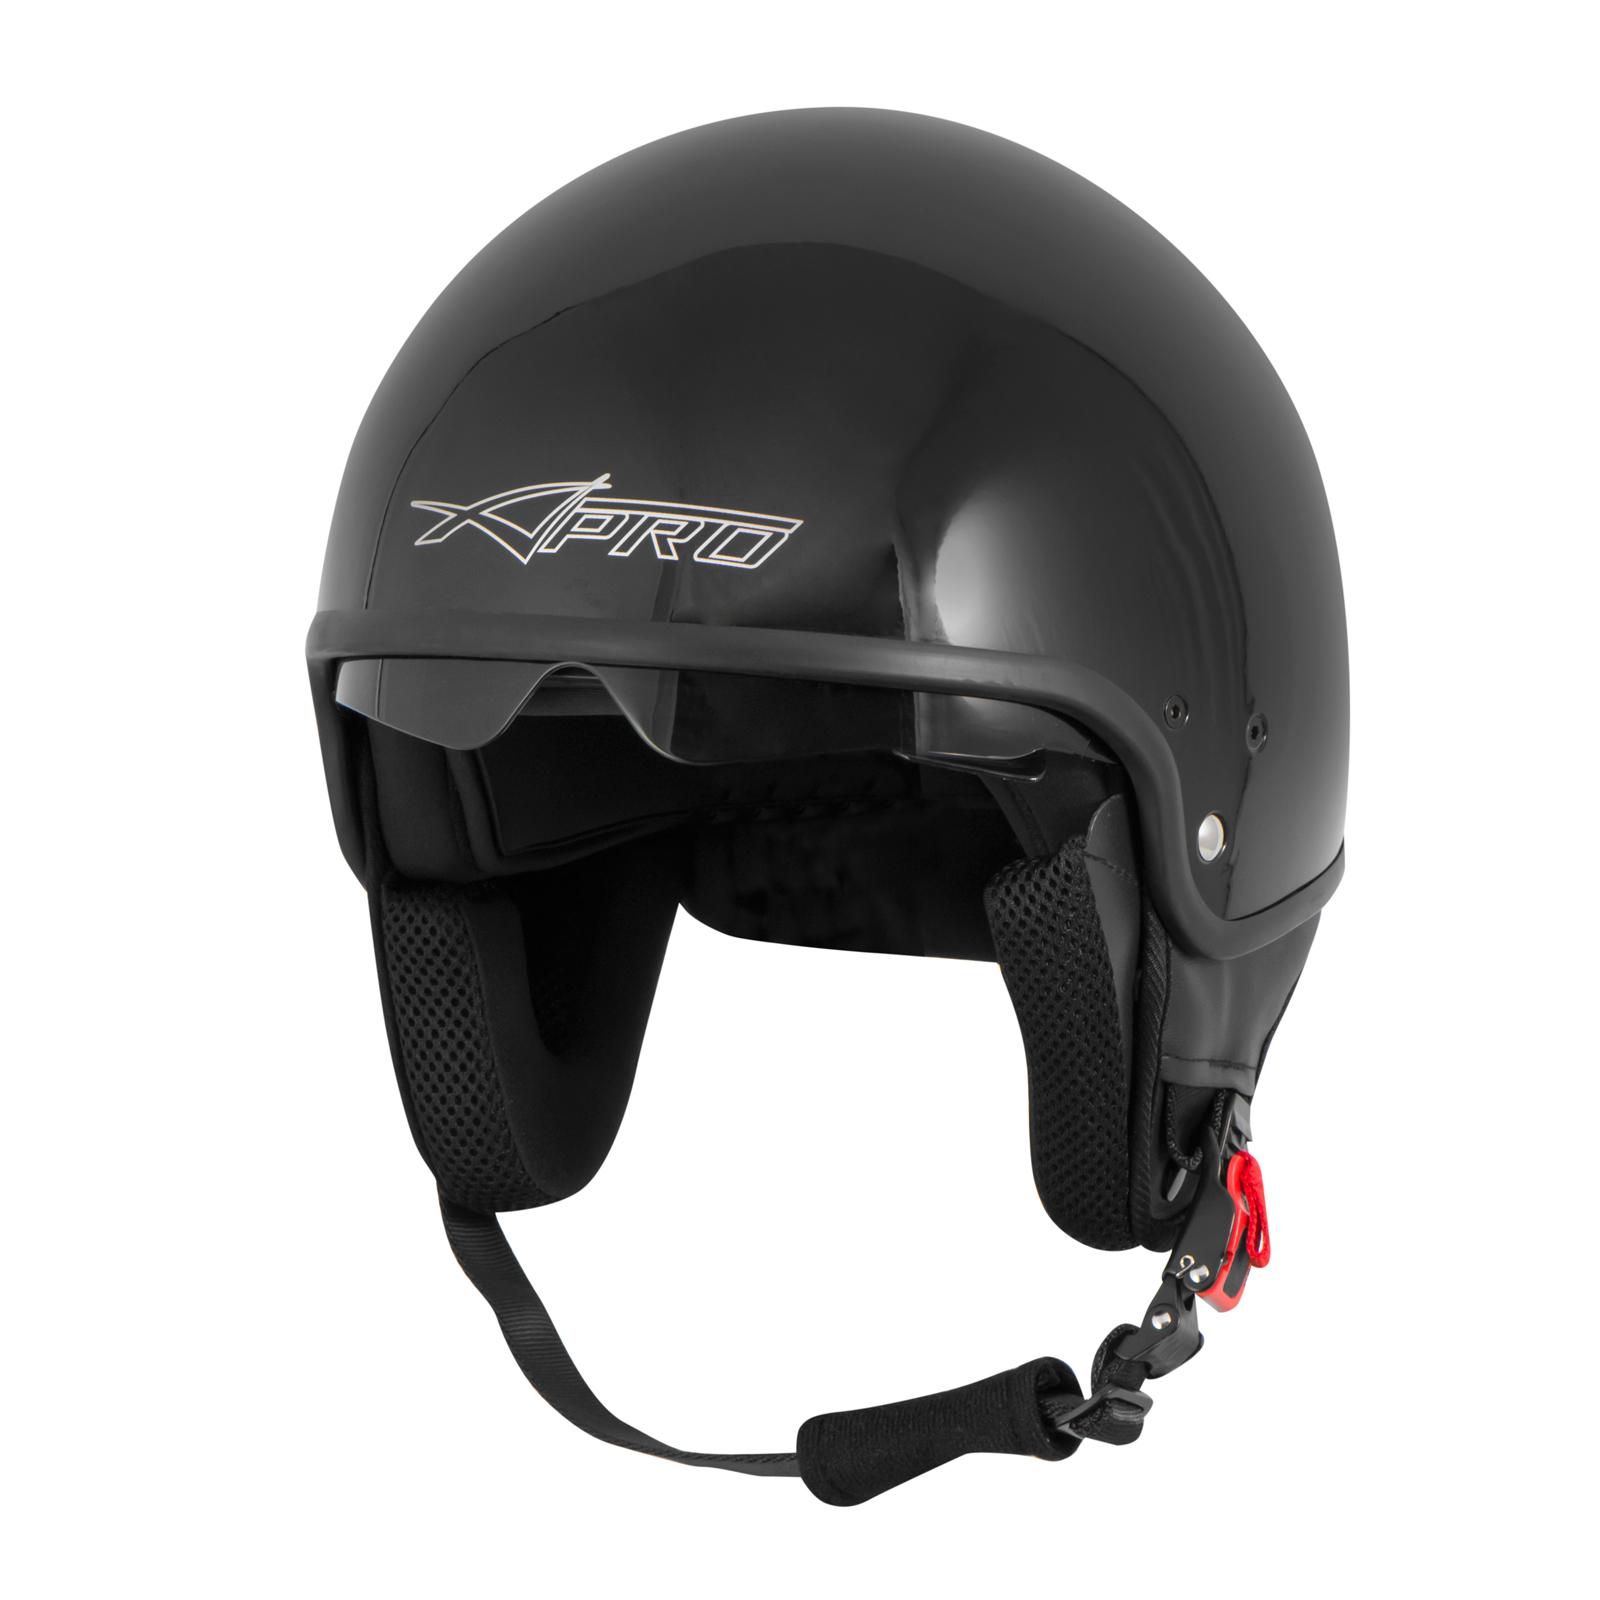 motorcycle open face classic jet helmet scooter inner sun. Black Bedroom Furniture Sets. Home Design Ideas